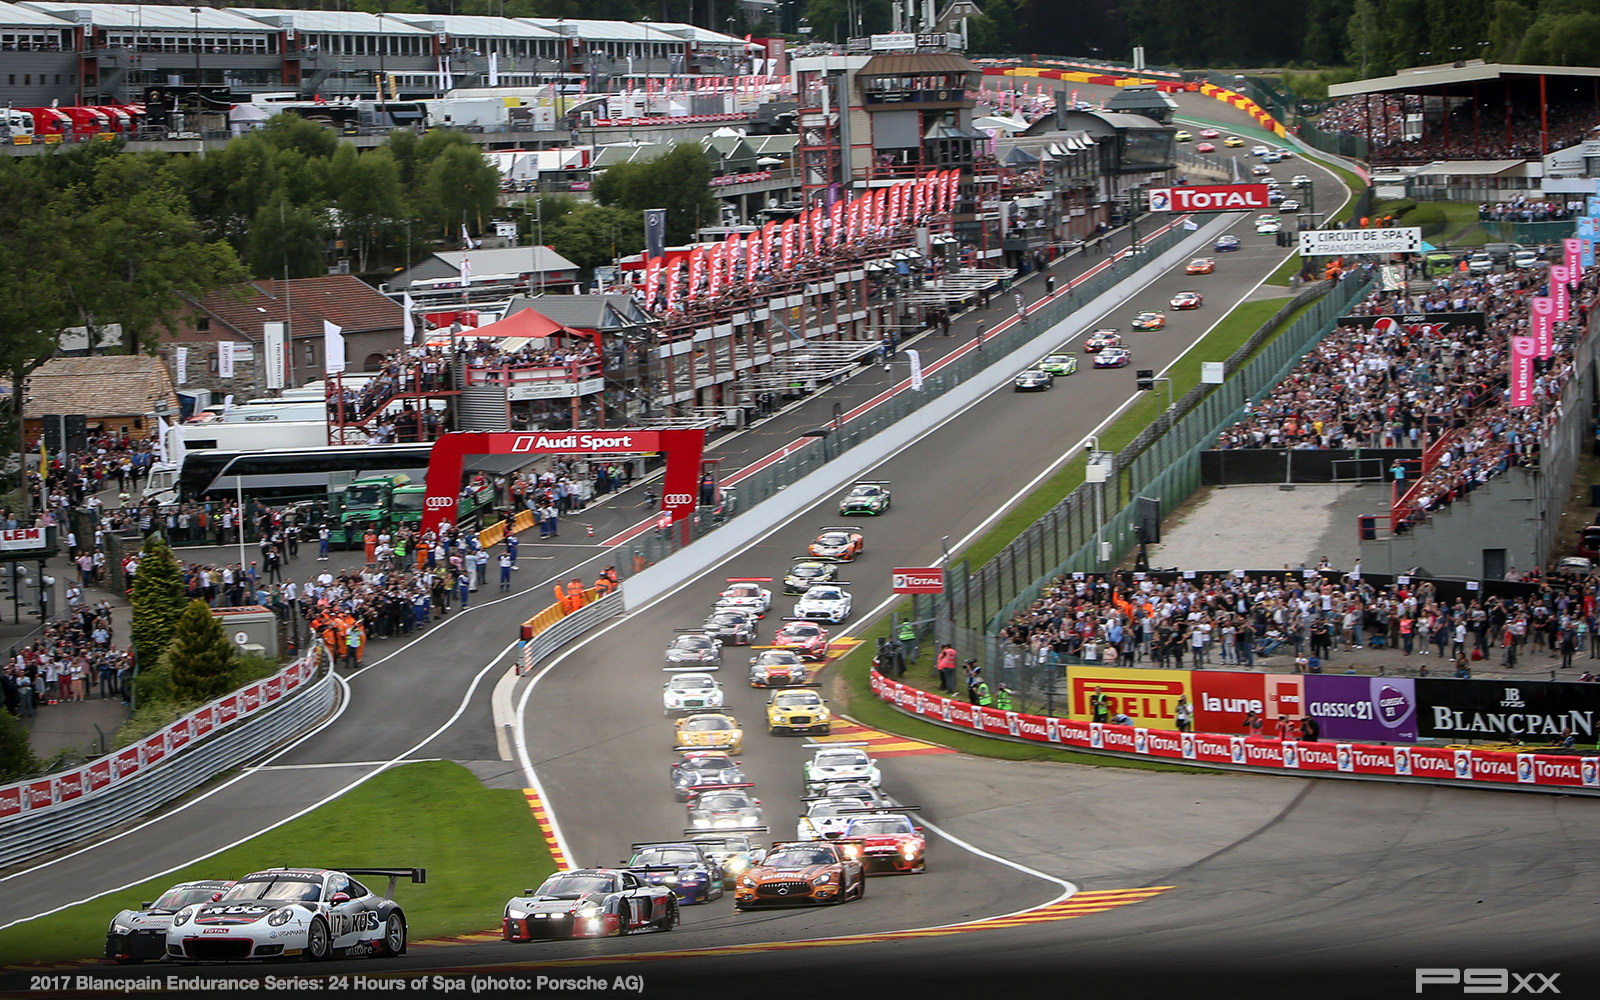 2017-24-Hours-of-Spa-Porsche-348